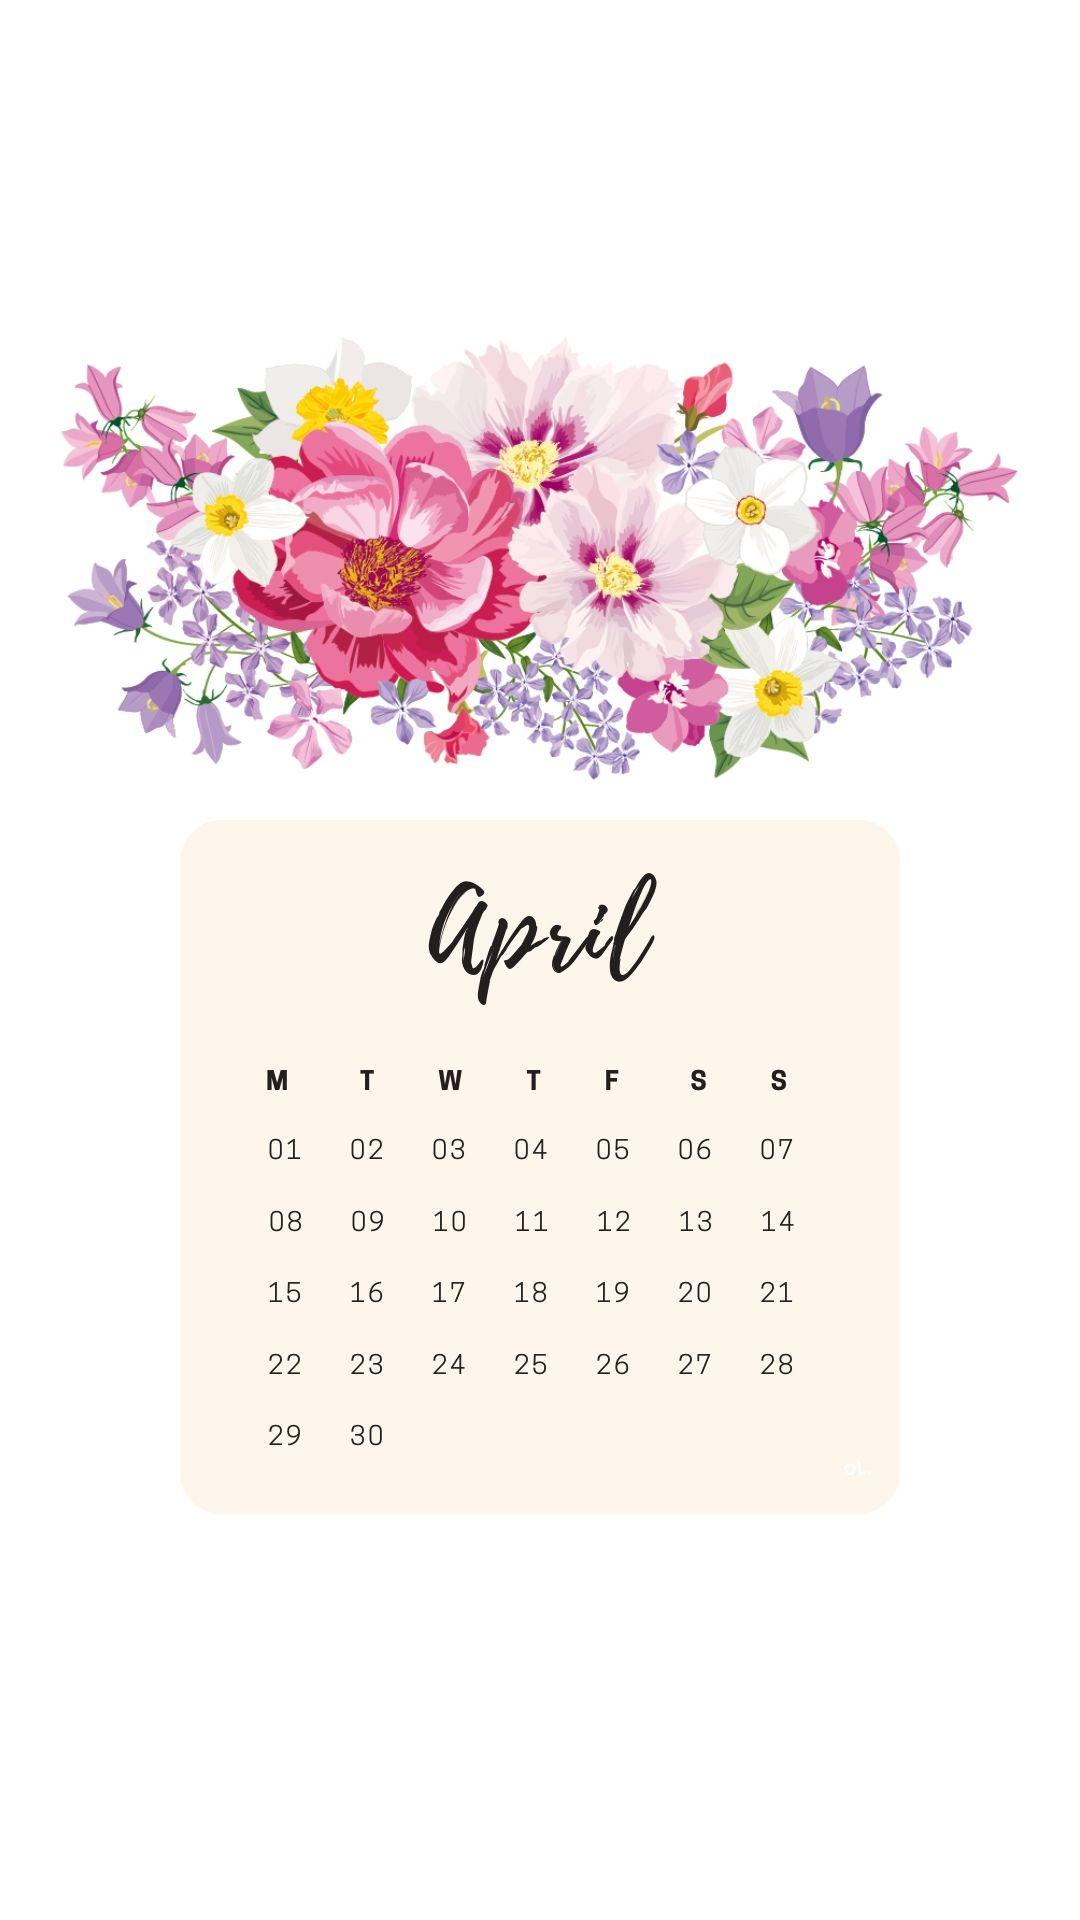 April 2019 Calendar Ipad Wallpaper Flower Desktop Wallpaper Ipad Wallpaper Calendar Wallpaper